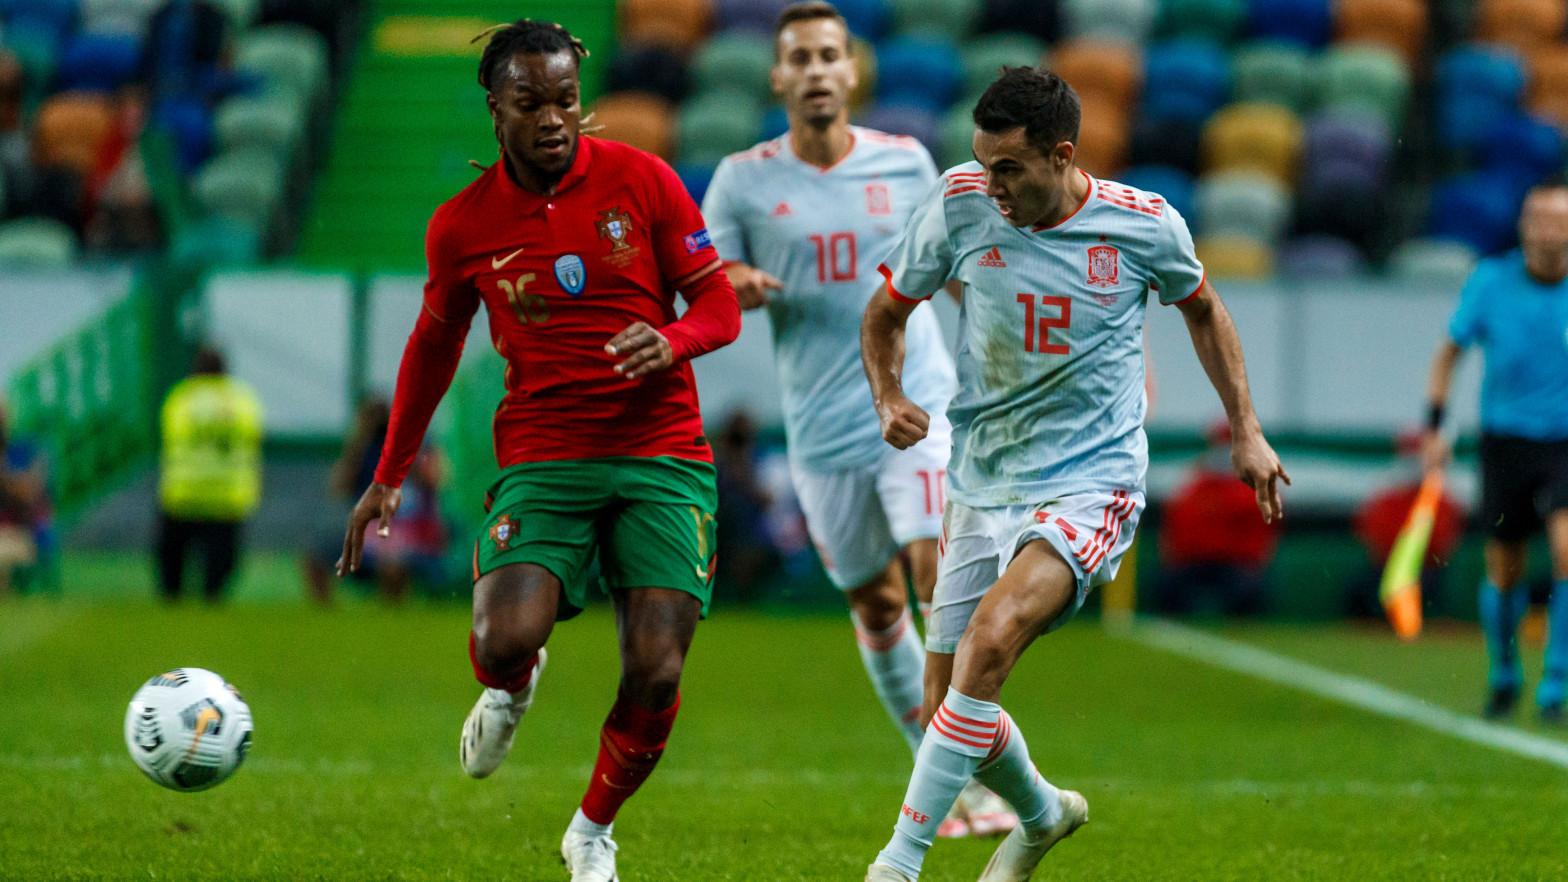 El Wanda acogerá un amistoso entre España y Portugal con un máximo de 22.590 espectadores